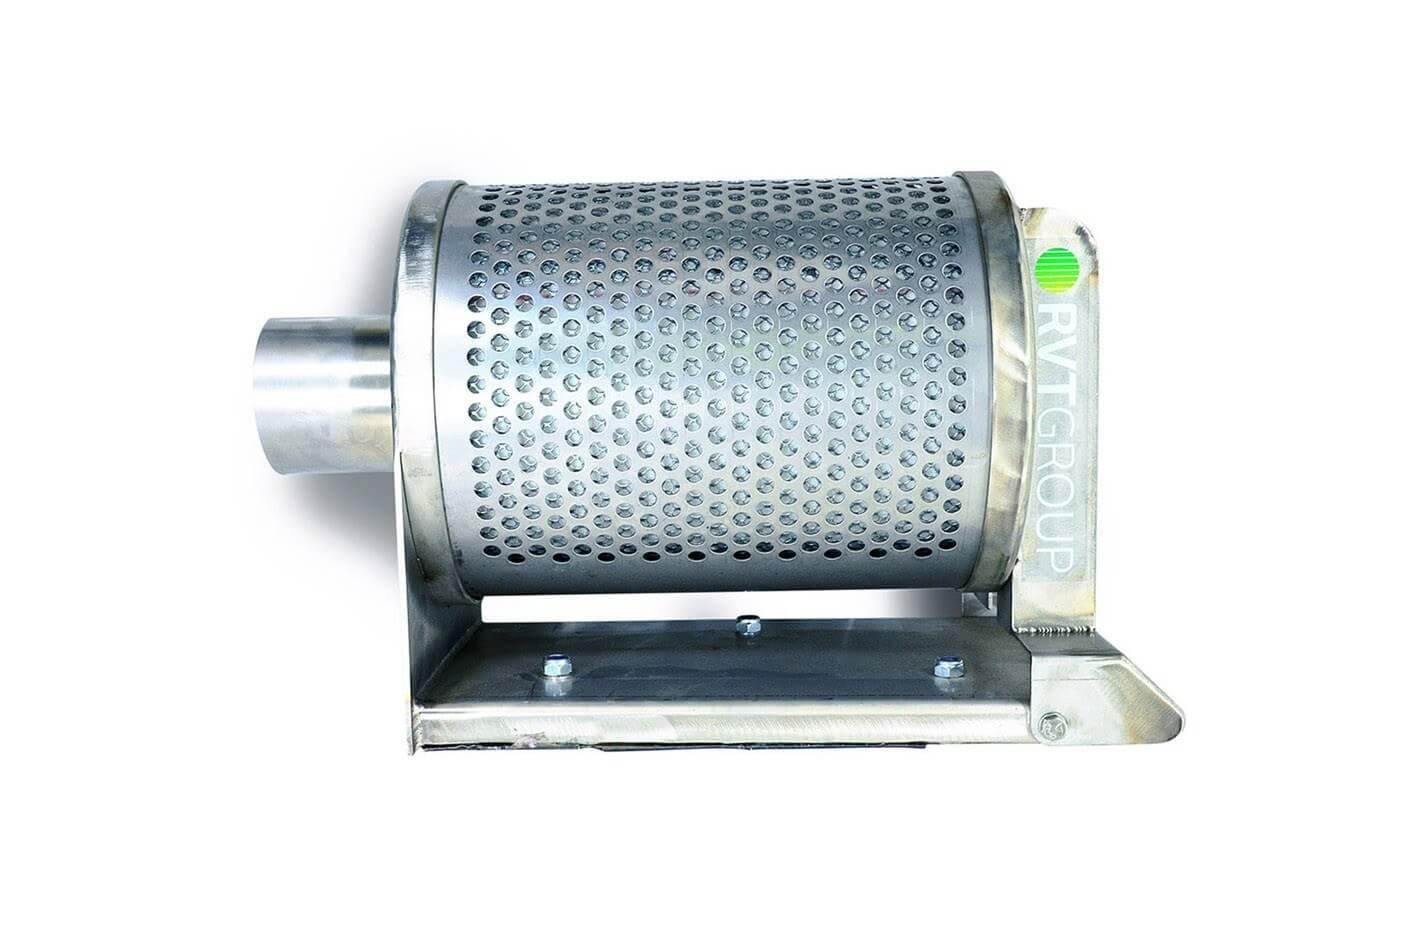 RAVEX Diesel Filter Kit M60_Fume Extraction